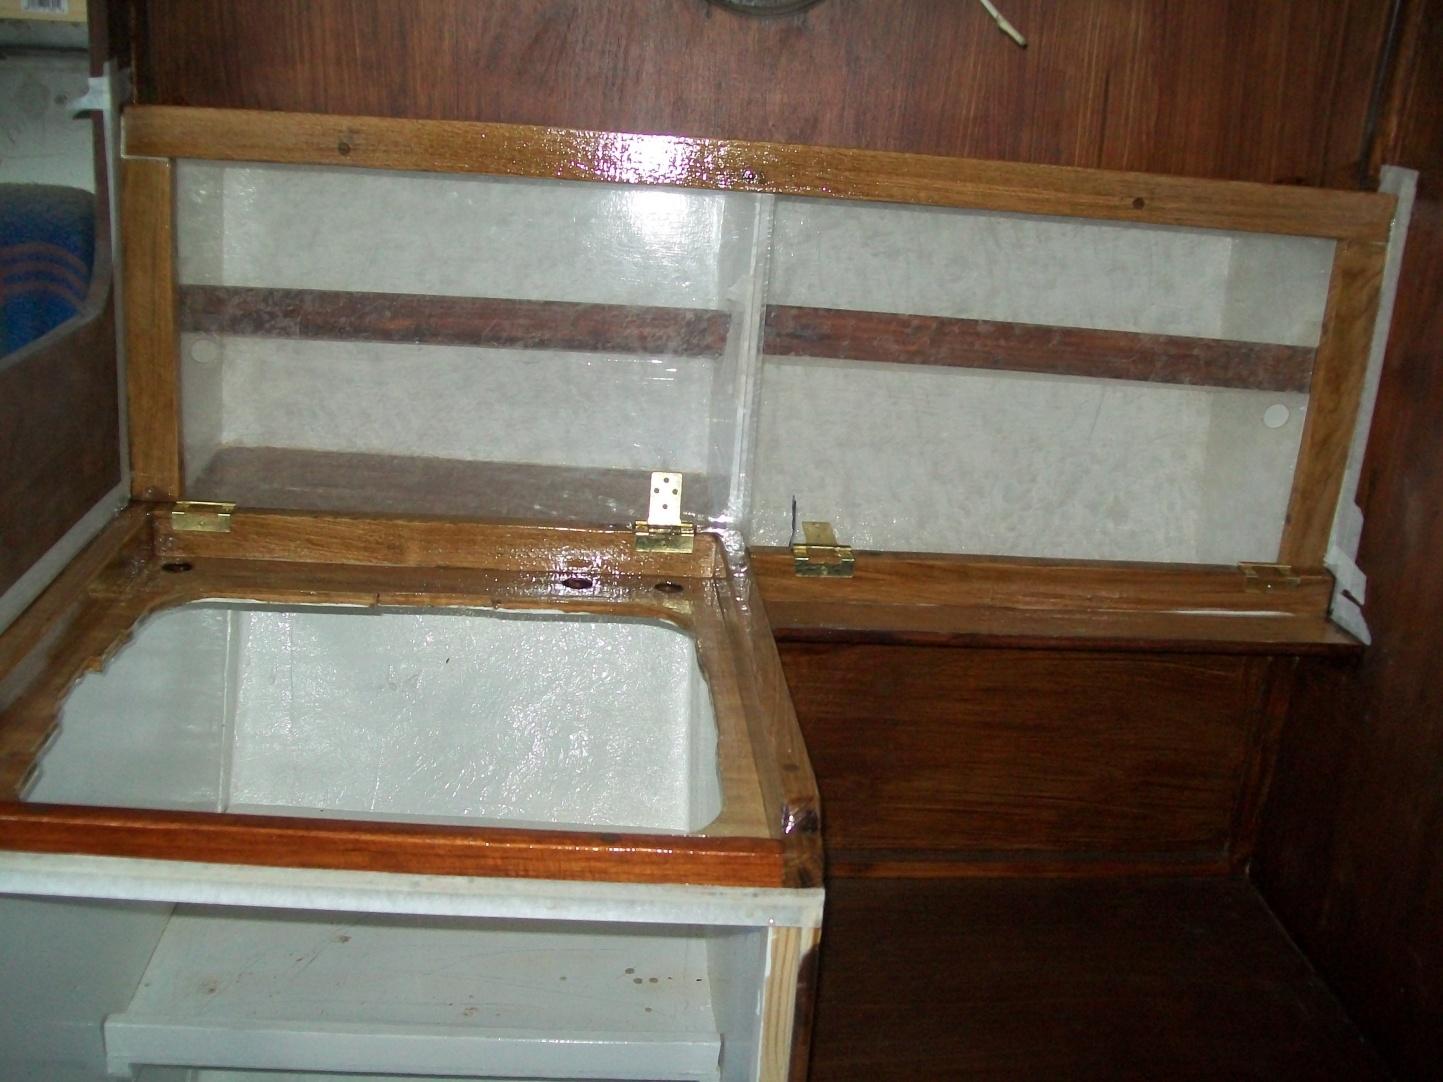 Click image for larger version  Name:hina fridge 001.jpg Views:196 Size:416.0 KB ID:47265